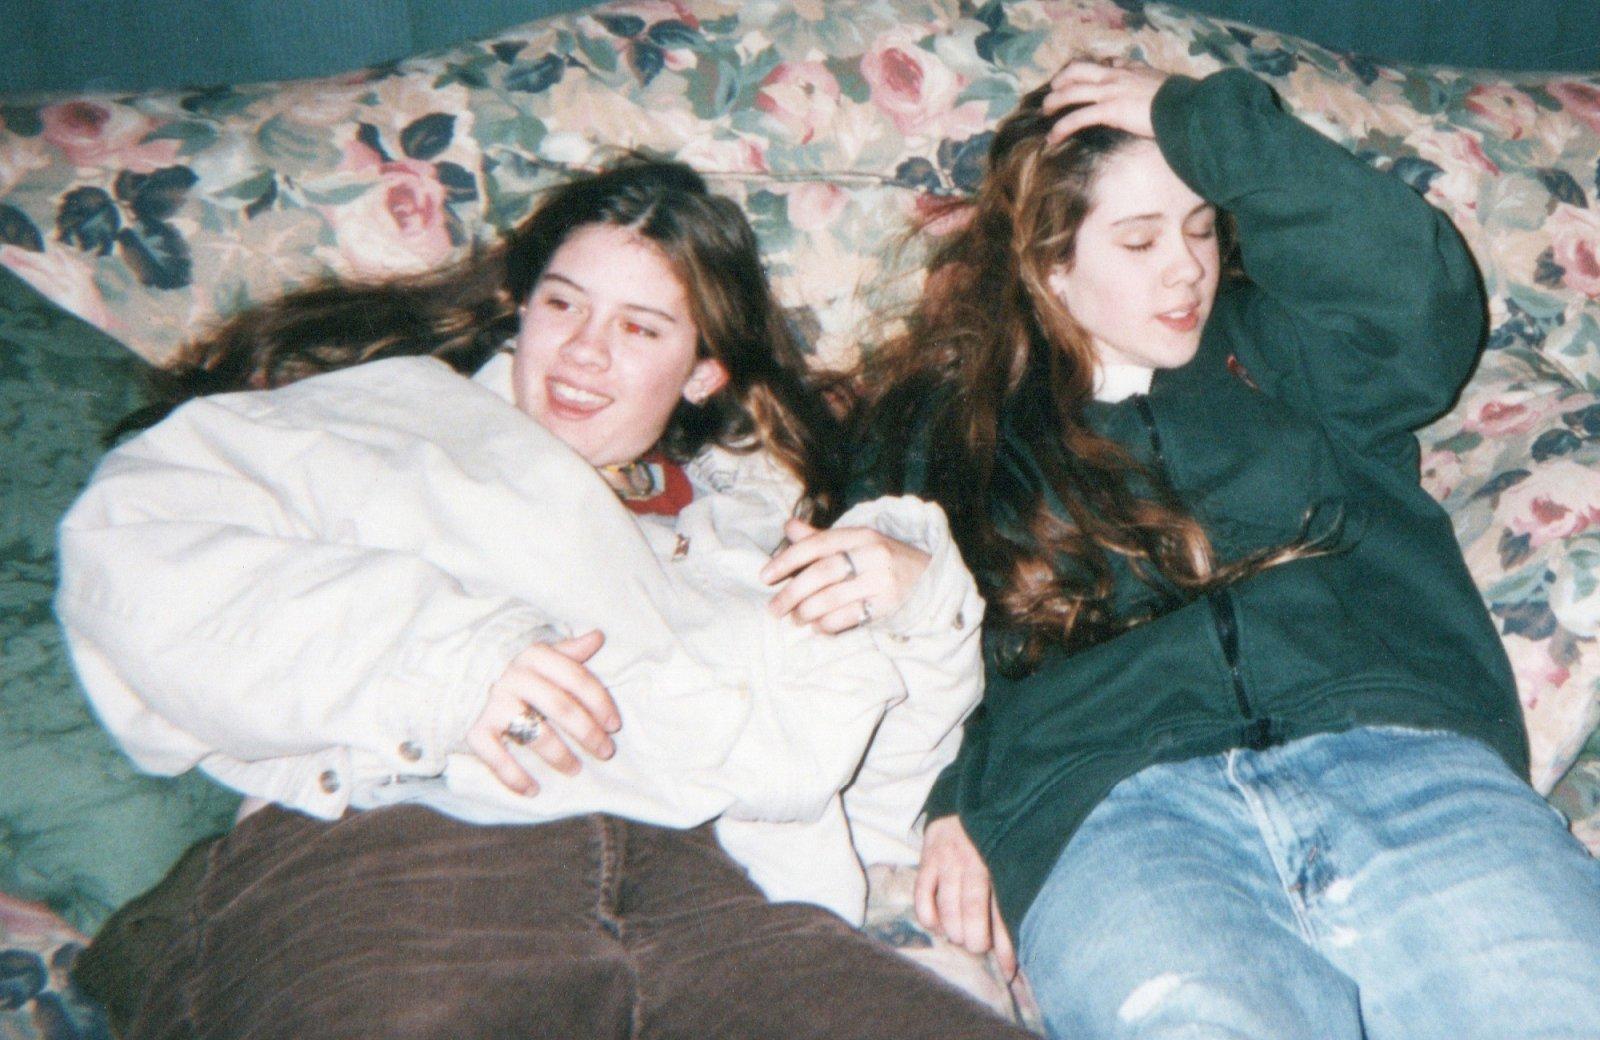 High school Tegan and Sara